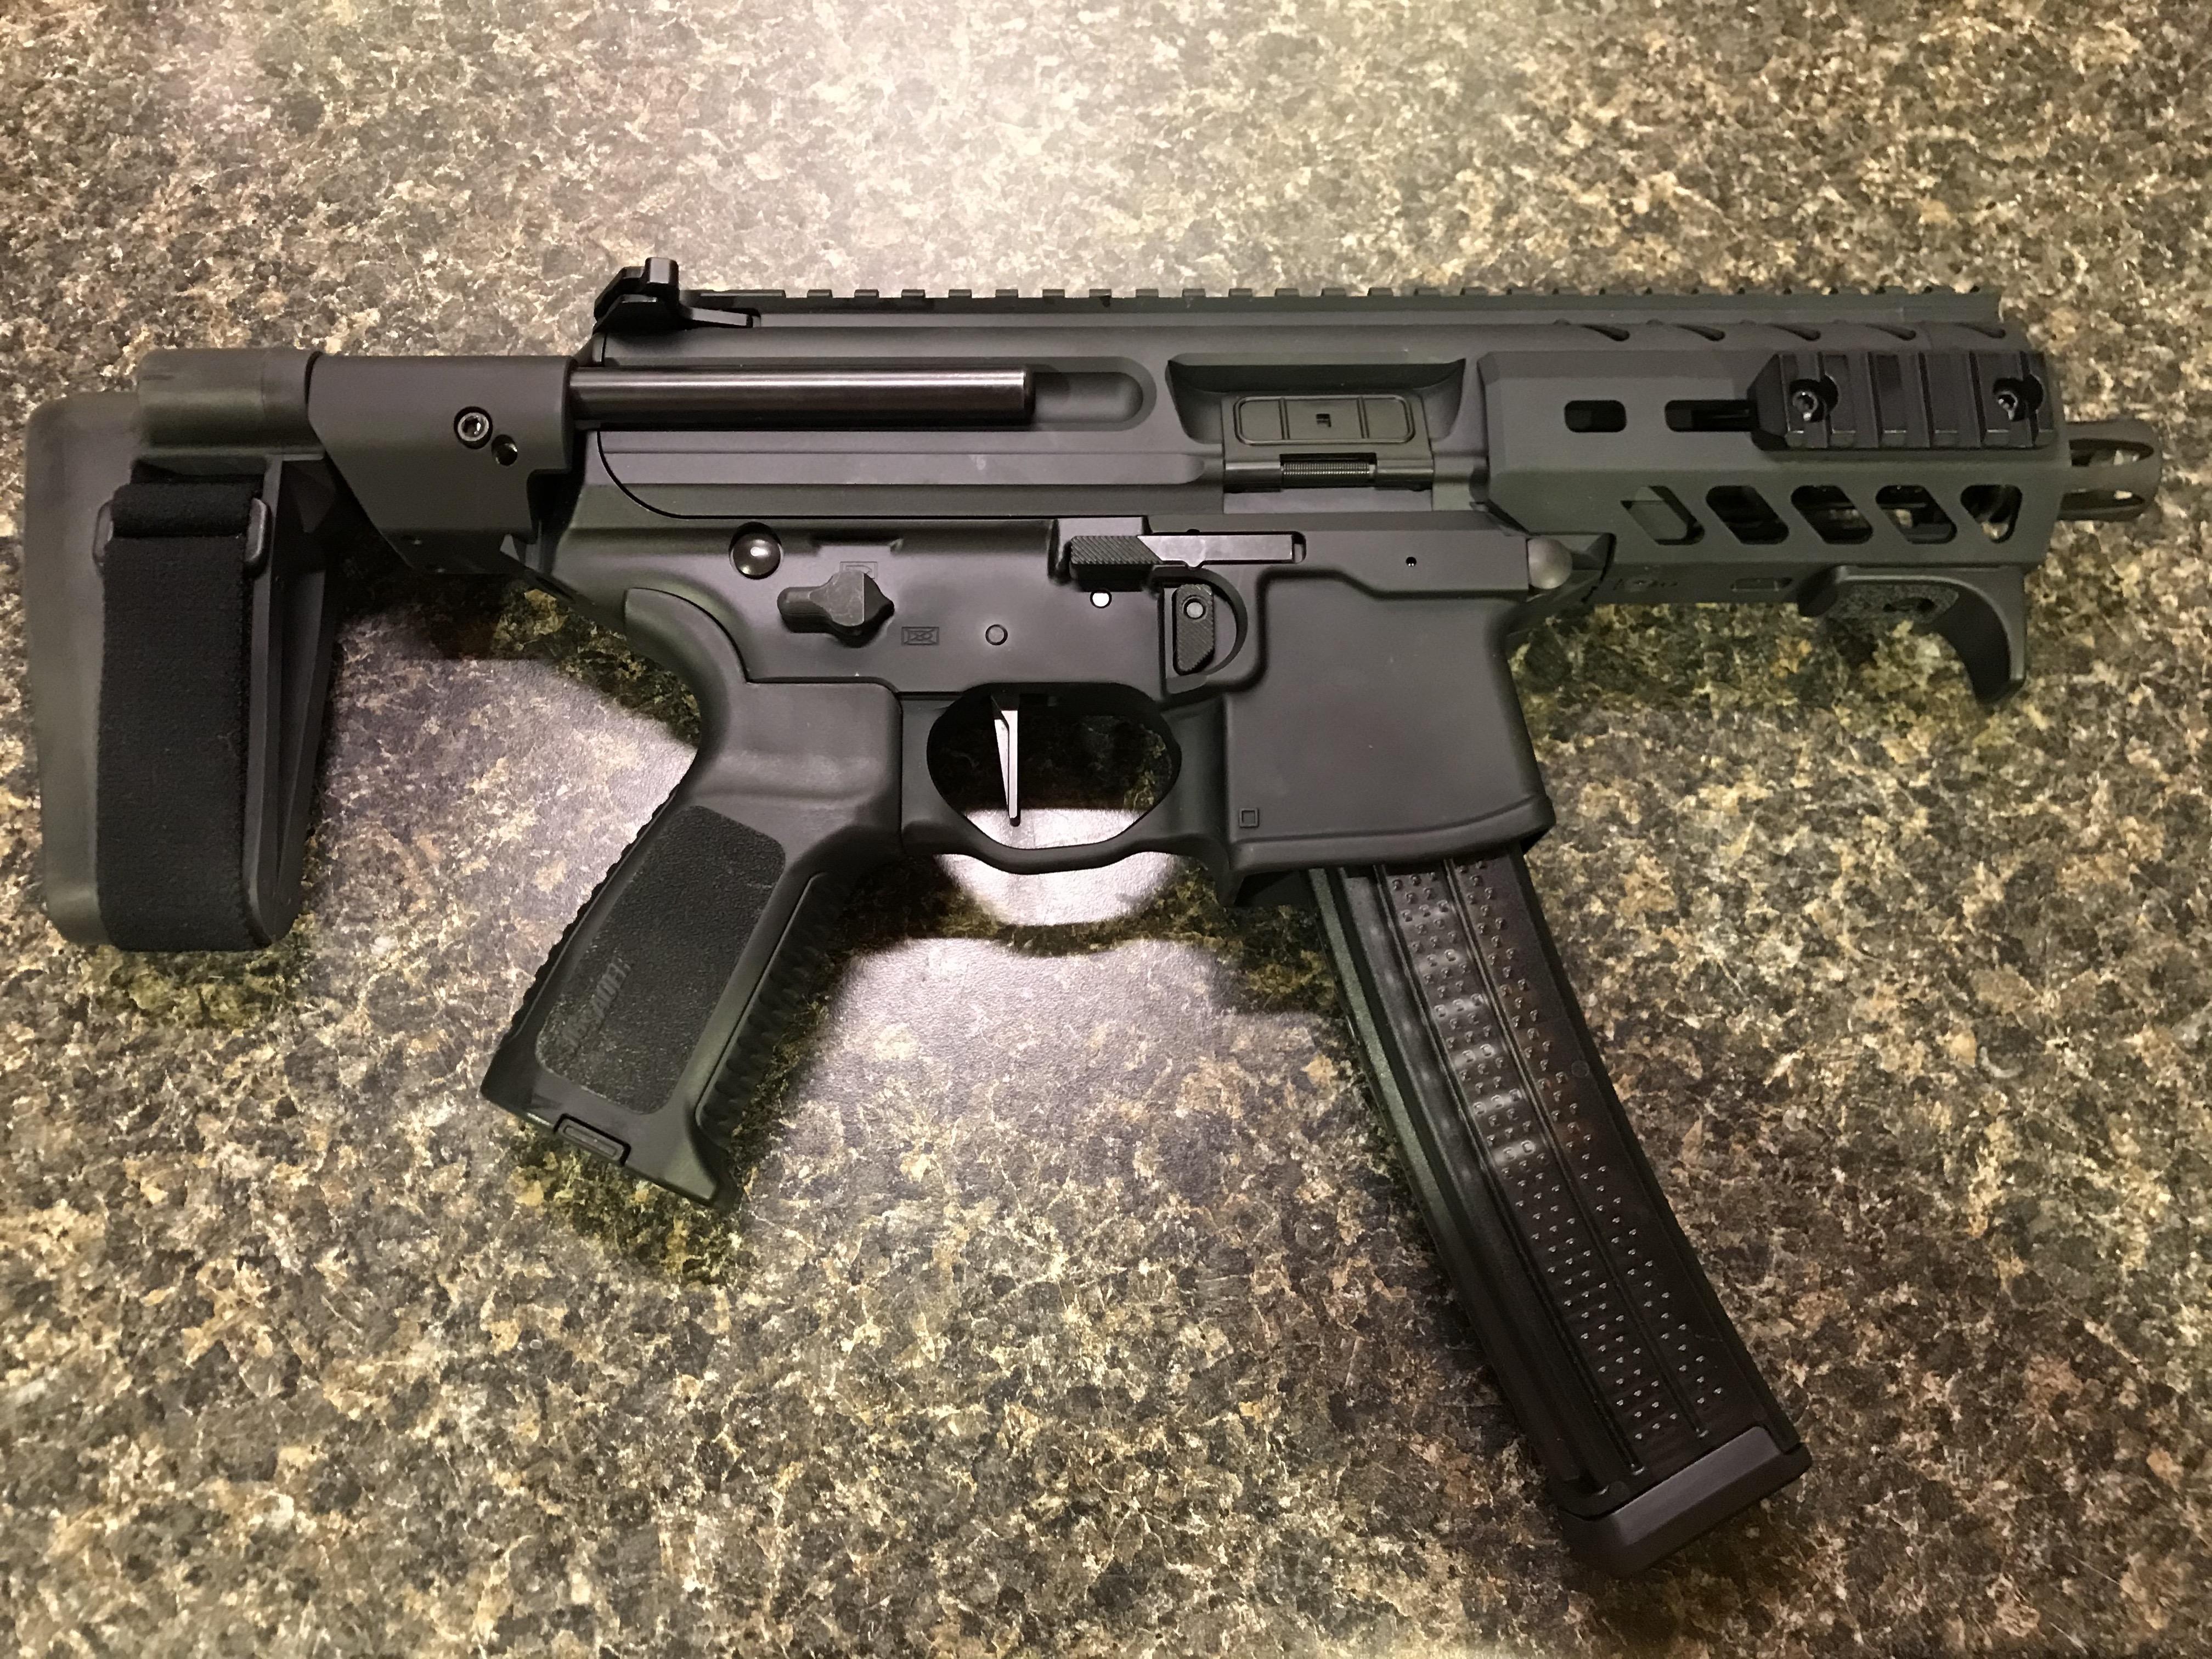 WTS:  SIG MPX-K 9mm Pistol-3684c2f8-9733-476a-a8f7-ac20593946a7.jpeg